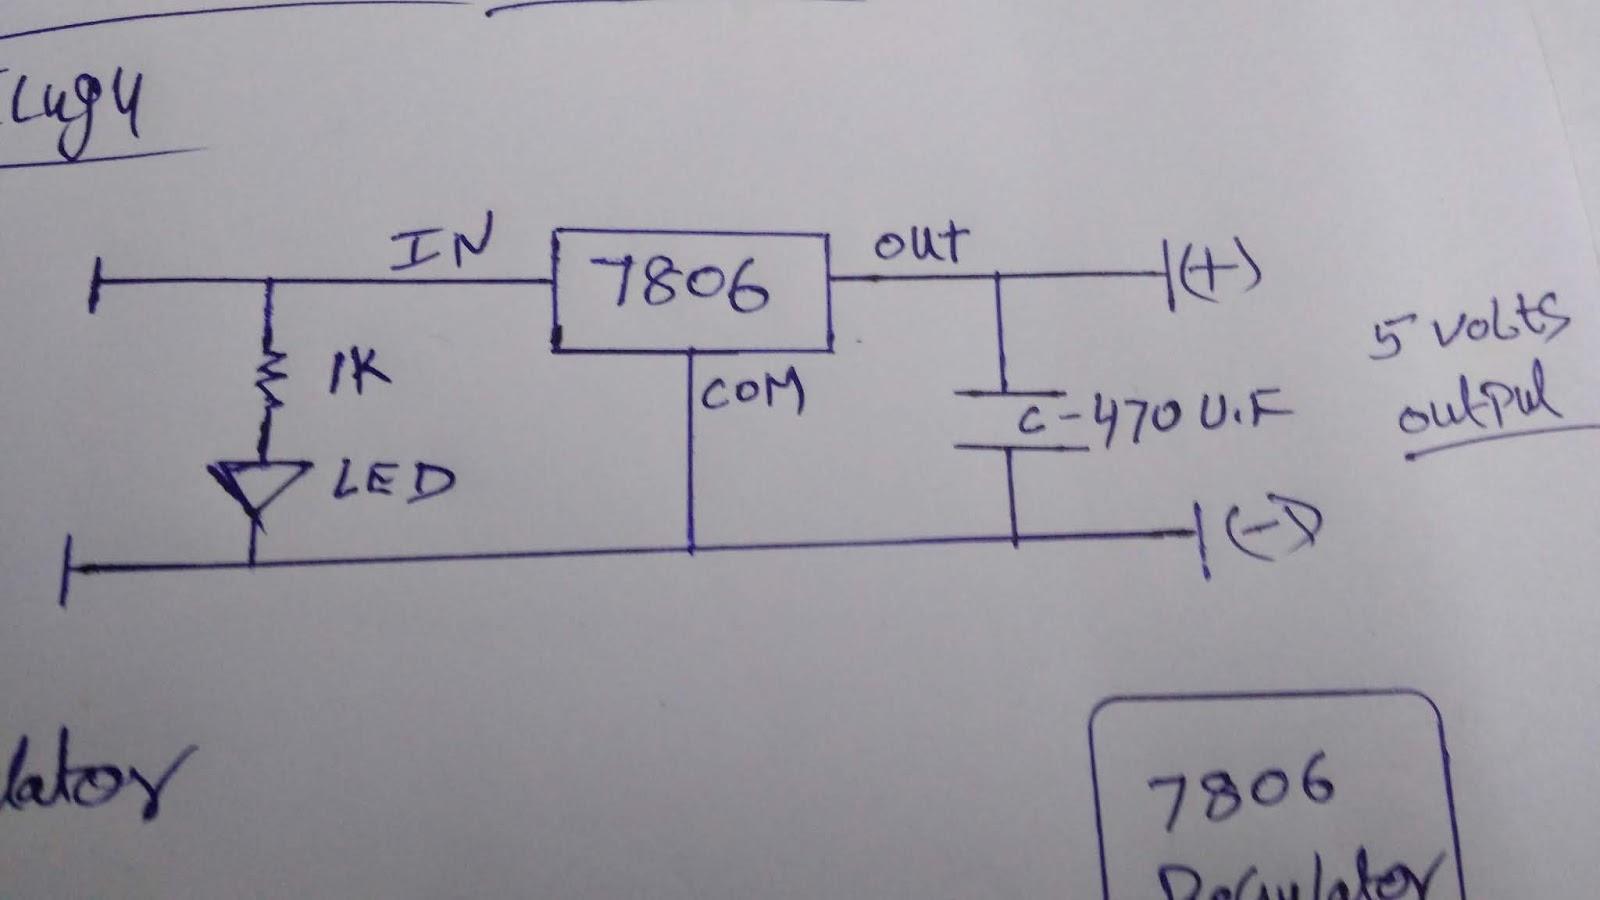 7806 regulator circuit | 6 volt regulator circuit using 7806 ic | 7806 voltage  regulator